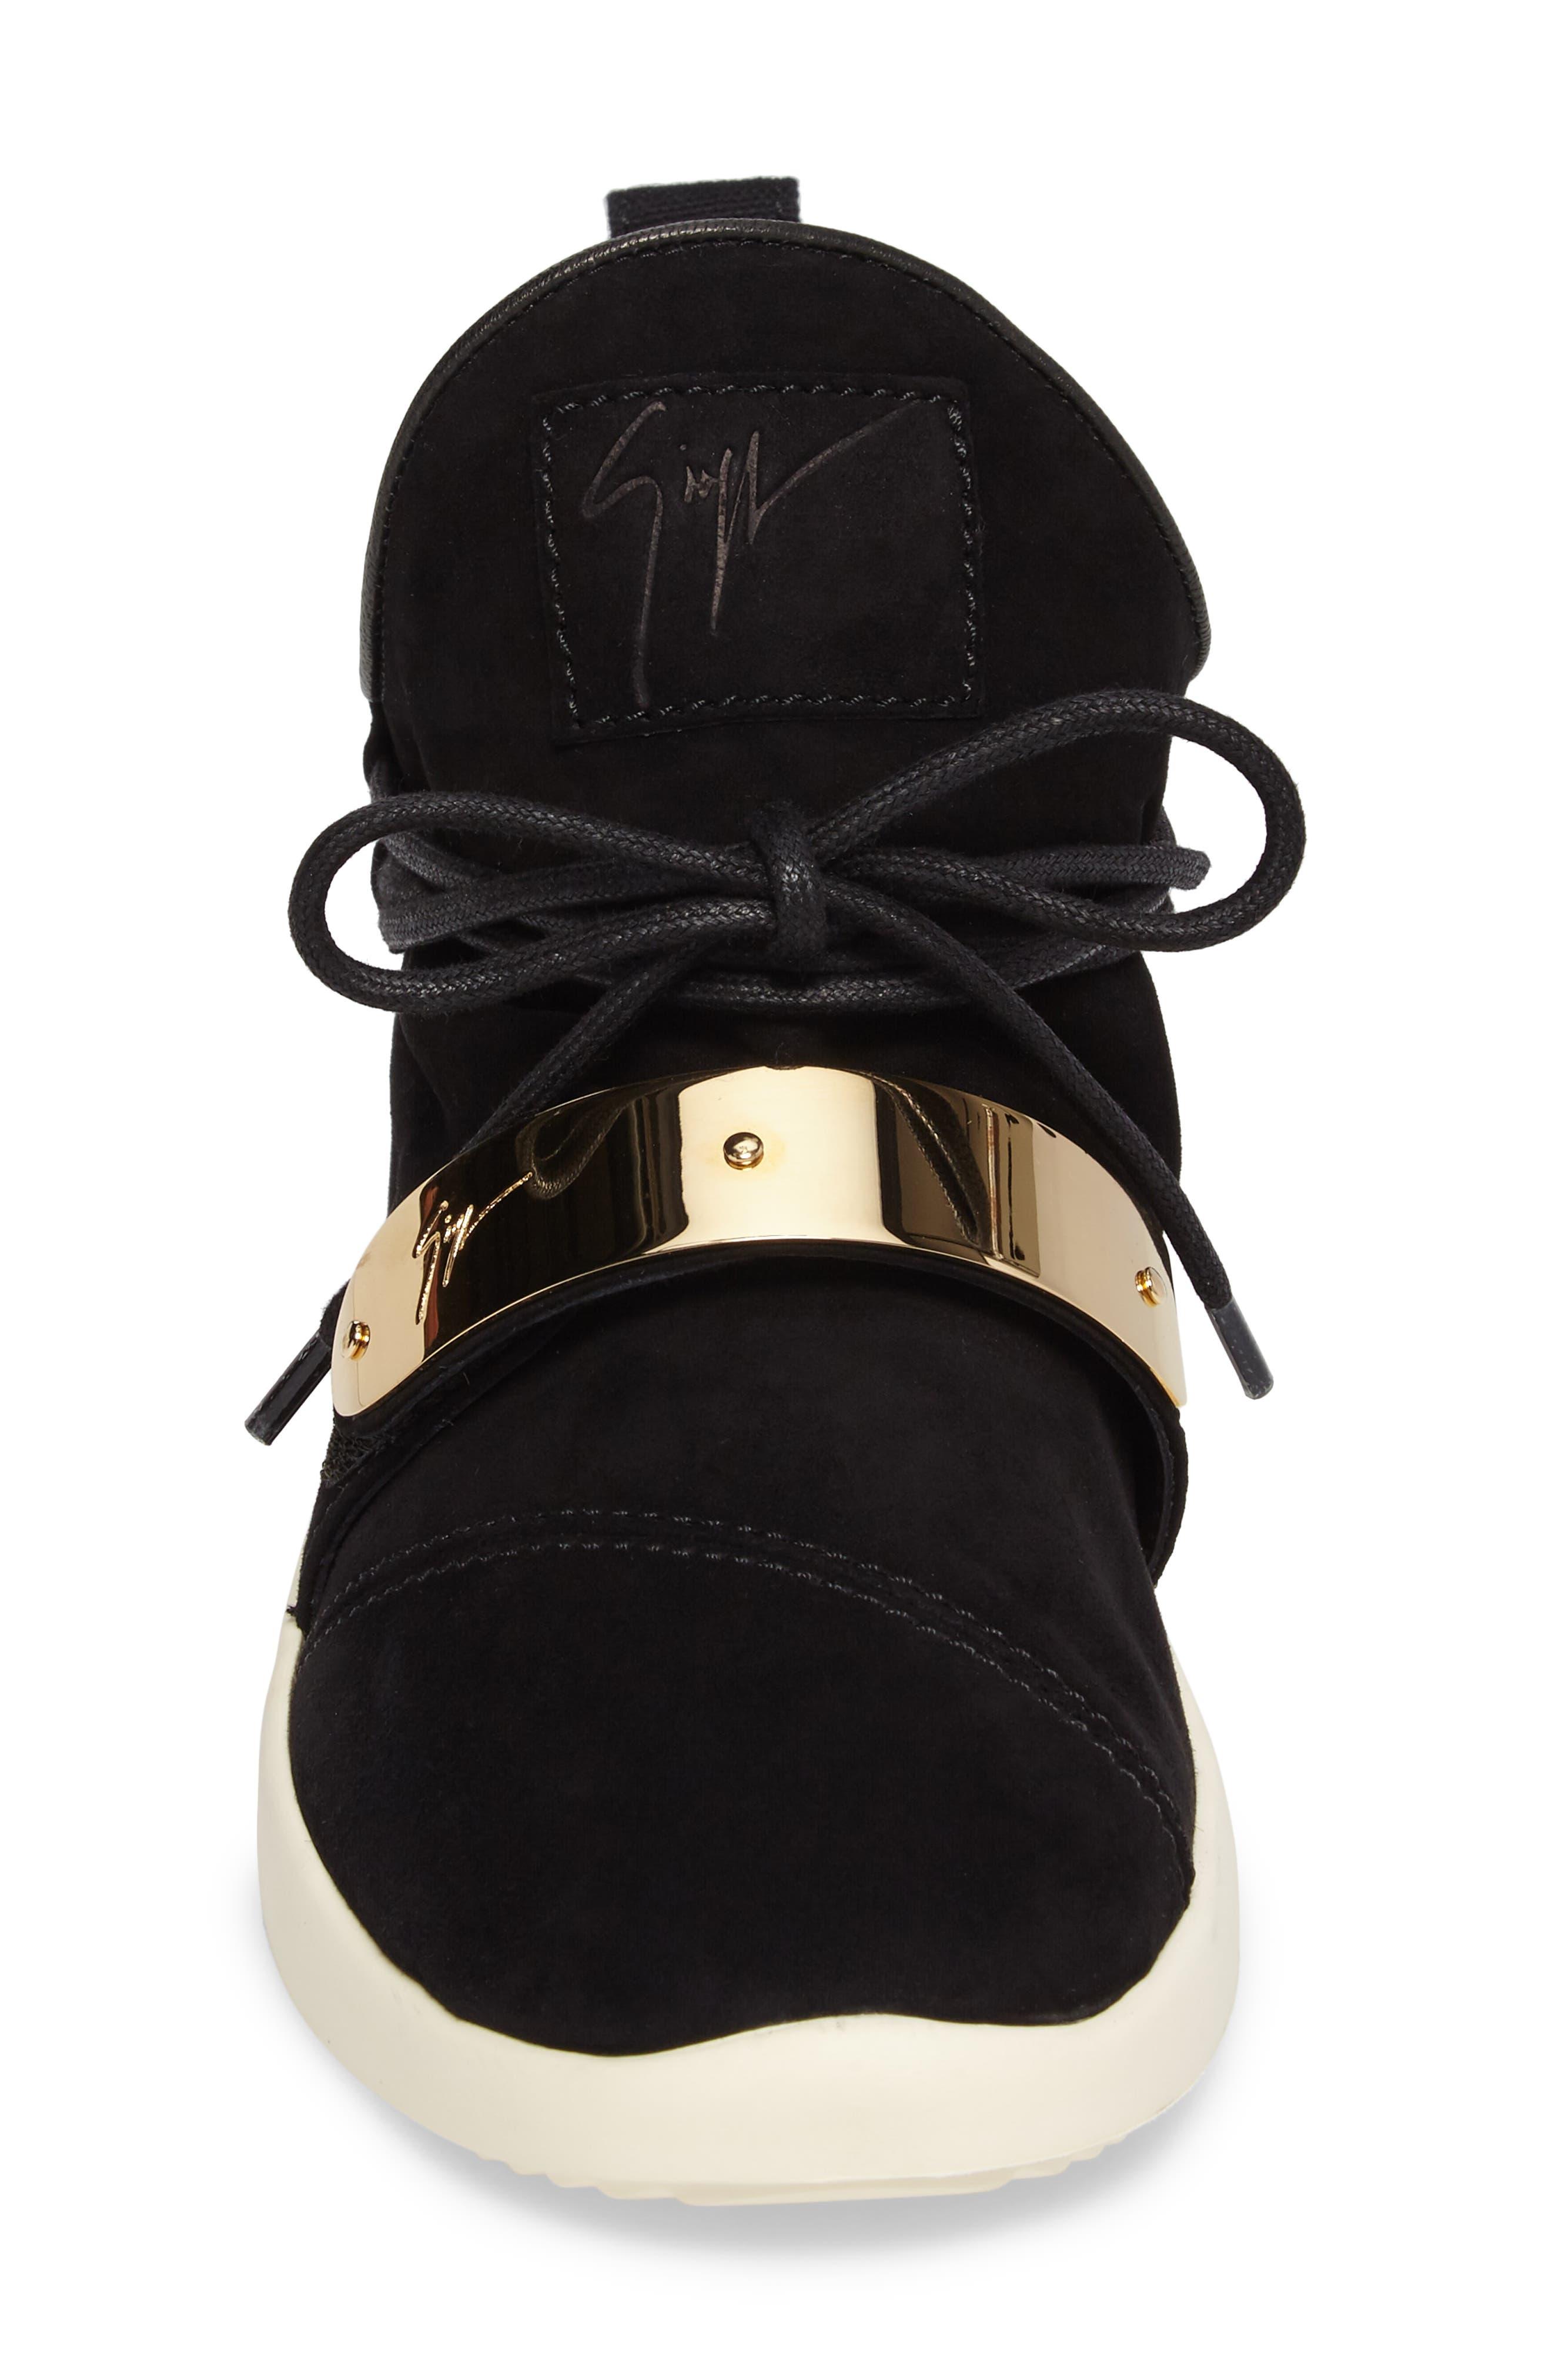 Gold Band Sneaker,                             Alternate thumbnail 4, color,                             Black